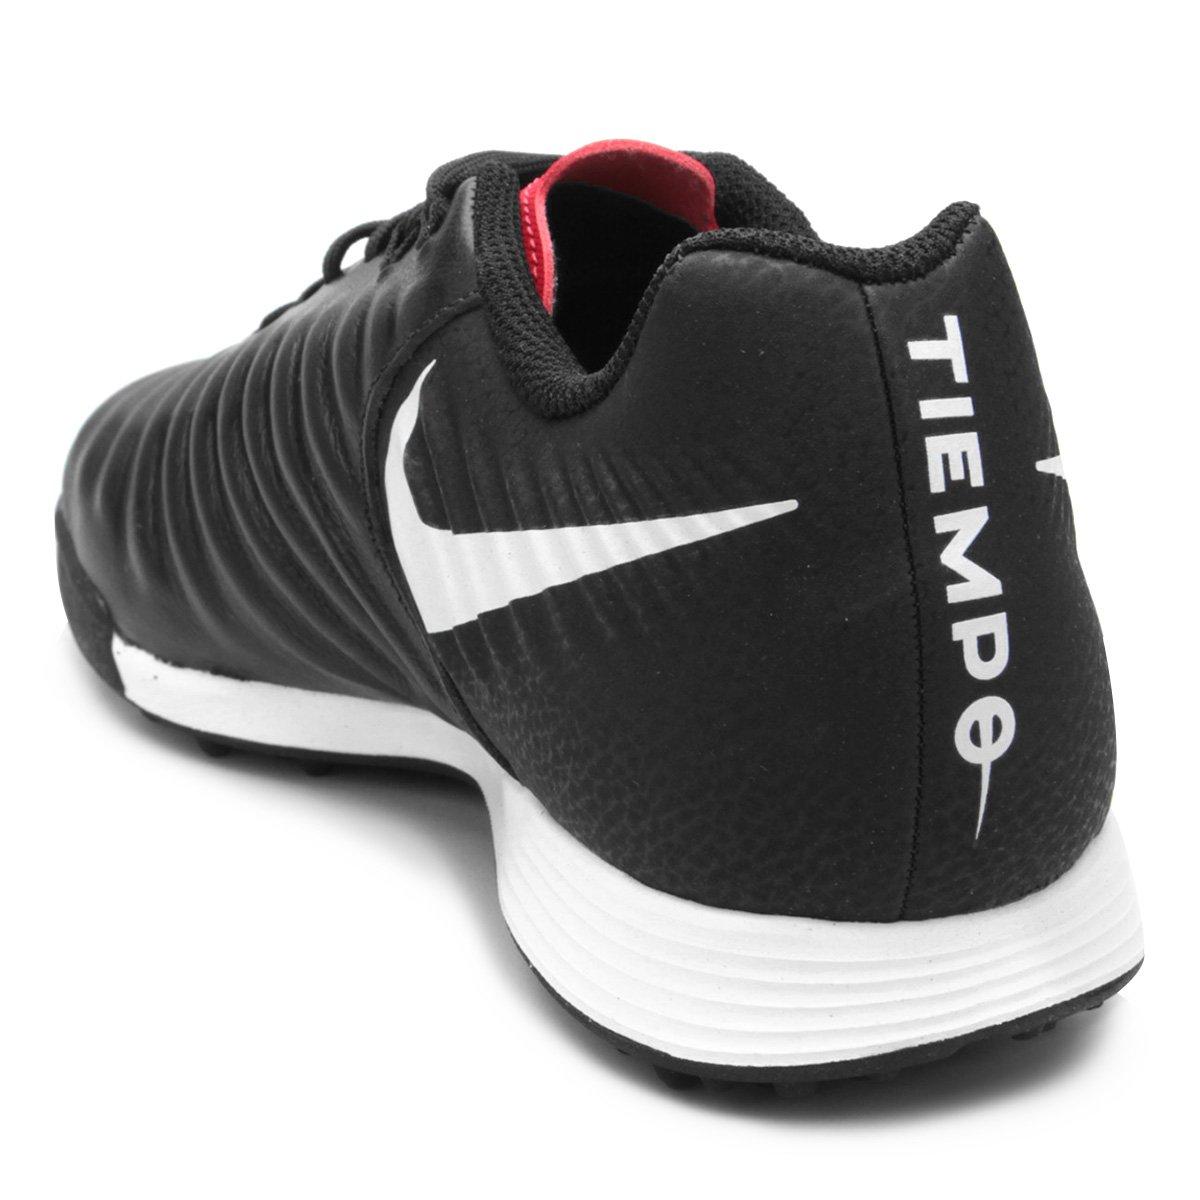 175021ac6d Chuteira Society Nike Tiempo Legend 7 Academy TF